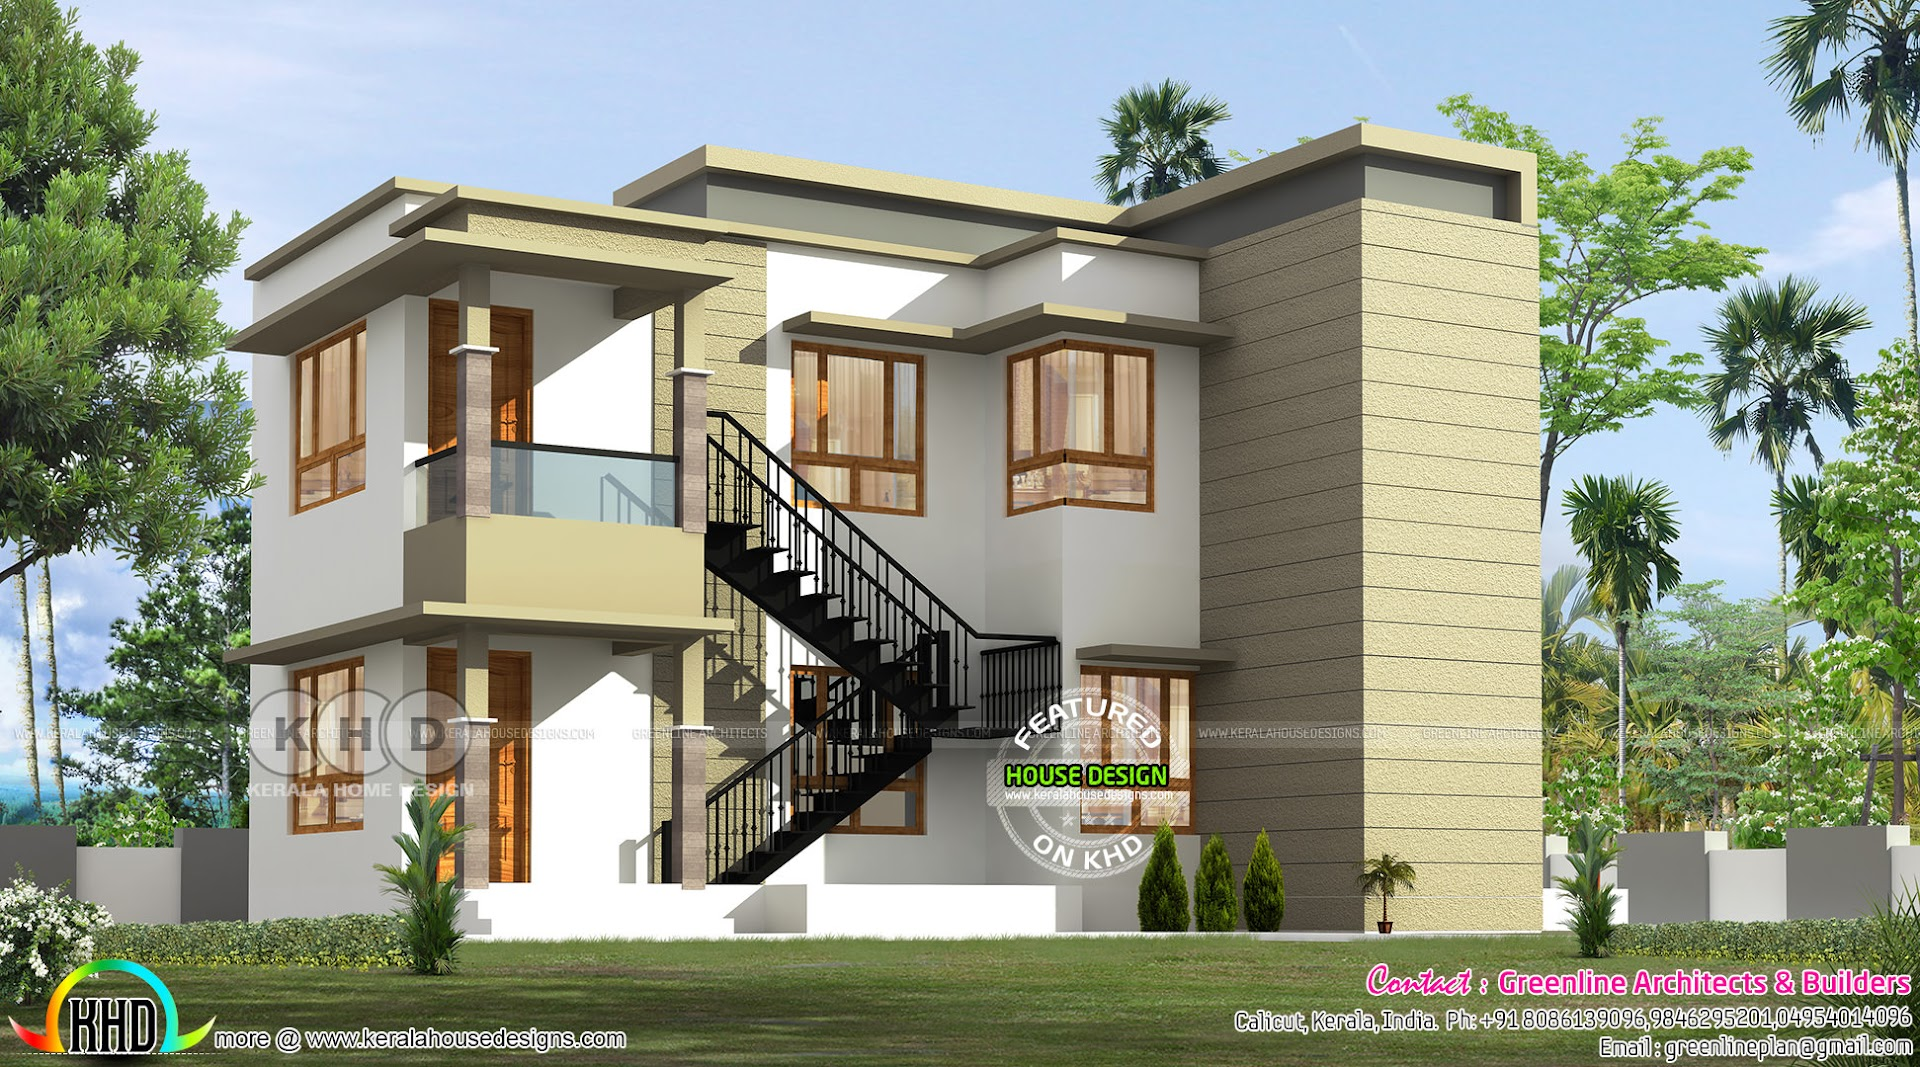 Low Budget Home 2000 Sq Ft 30 Lakhs Kerala Home Design Bloglovin